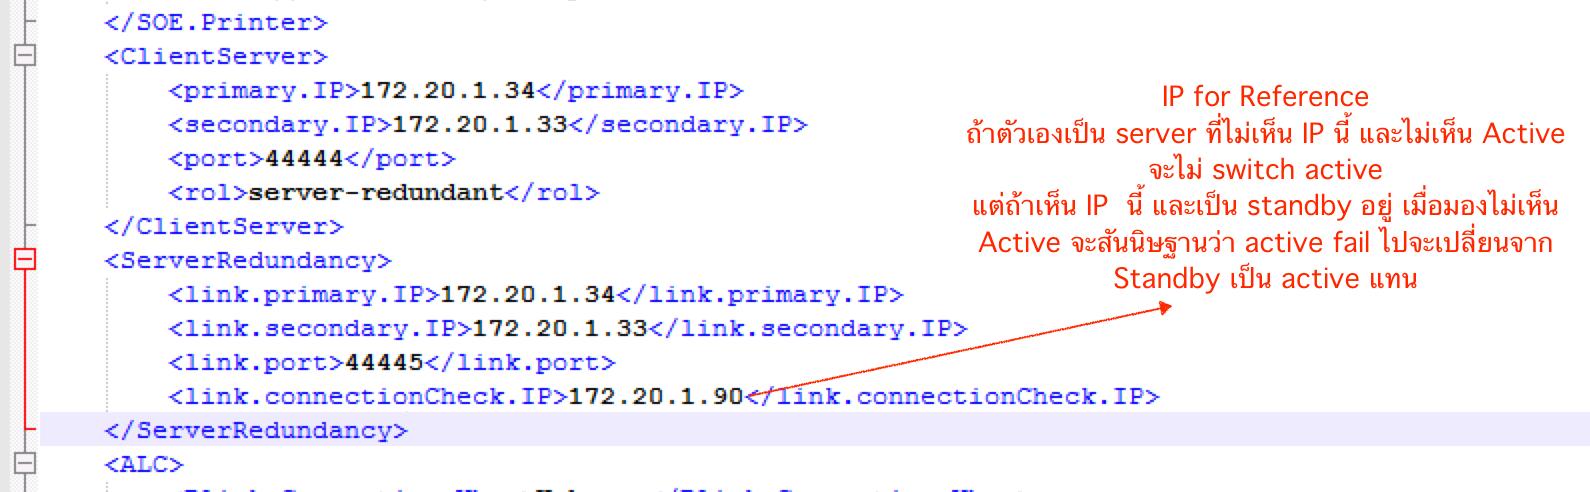 Redundancy_CheckIP.png